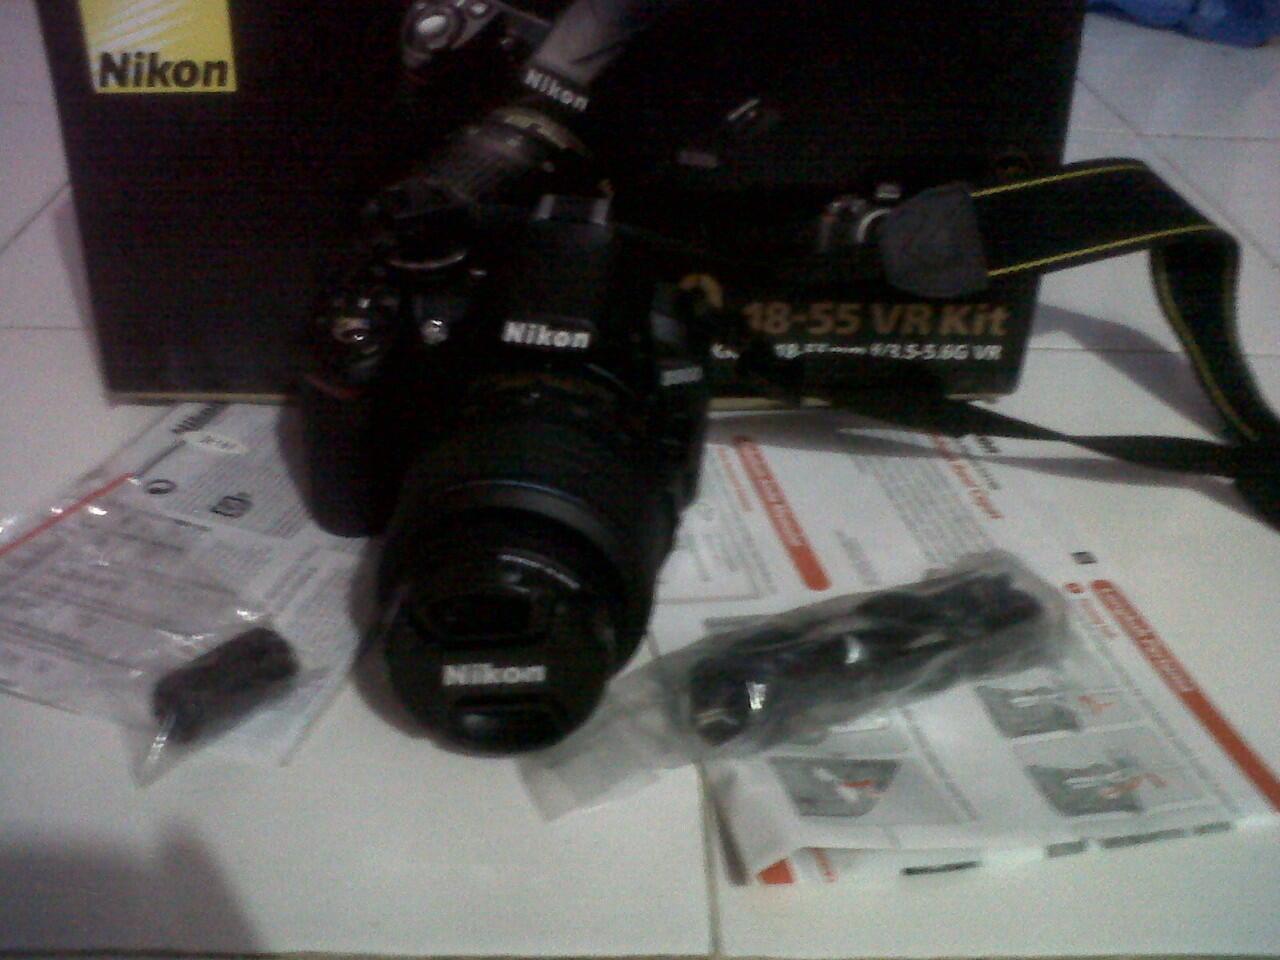 WTS>Nikon D3100 Vr Kit 18-55 garansi ALTA,lengkap+pelindung lensa